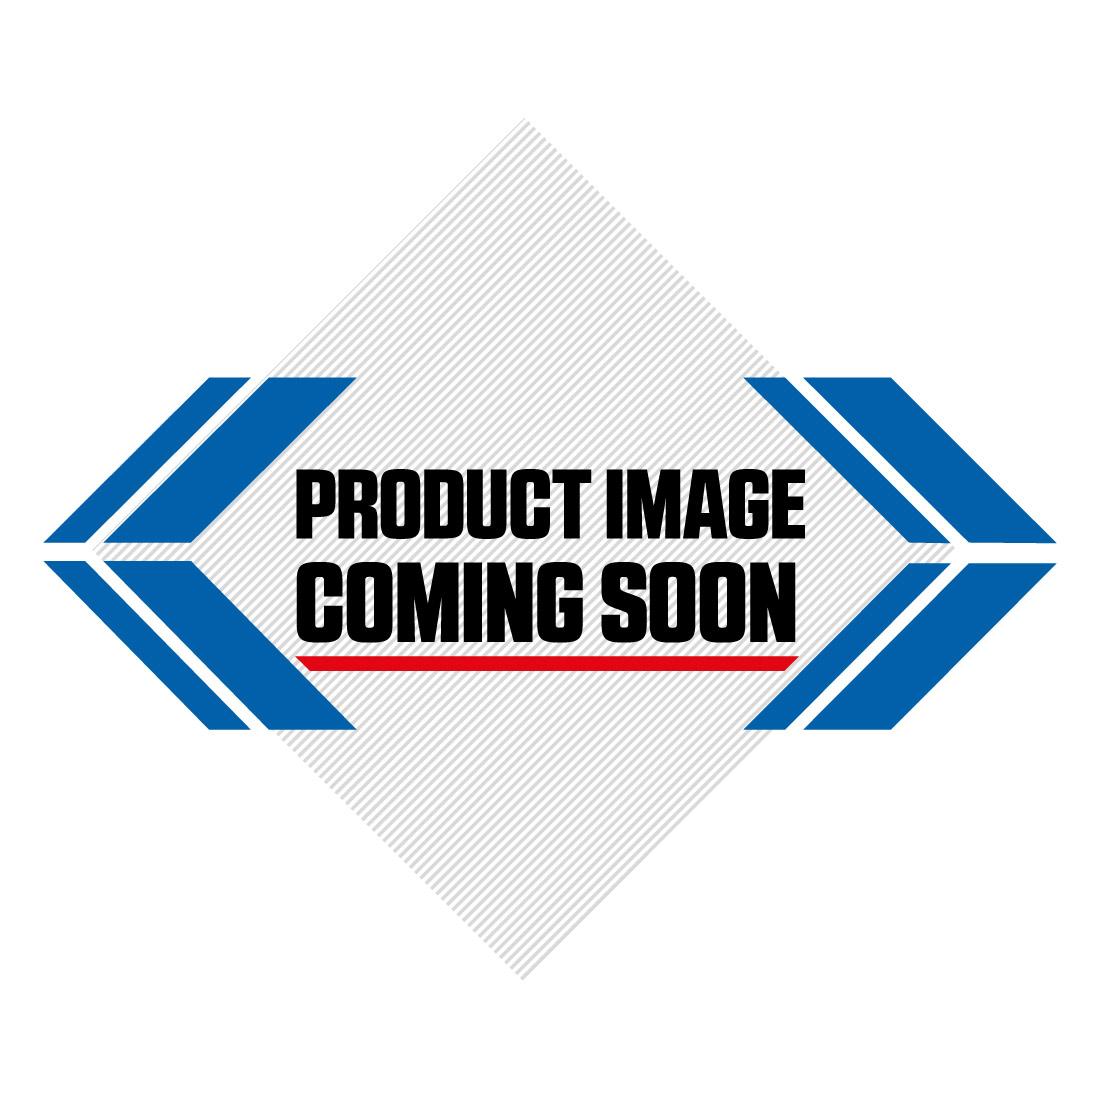 Suzuki Restyled Plastic Kit  RM 85 (00-20) RM Yellow 01-on Image-0